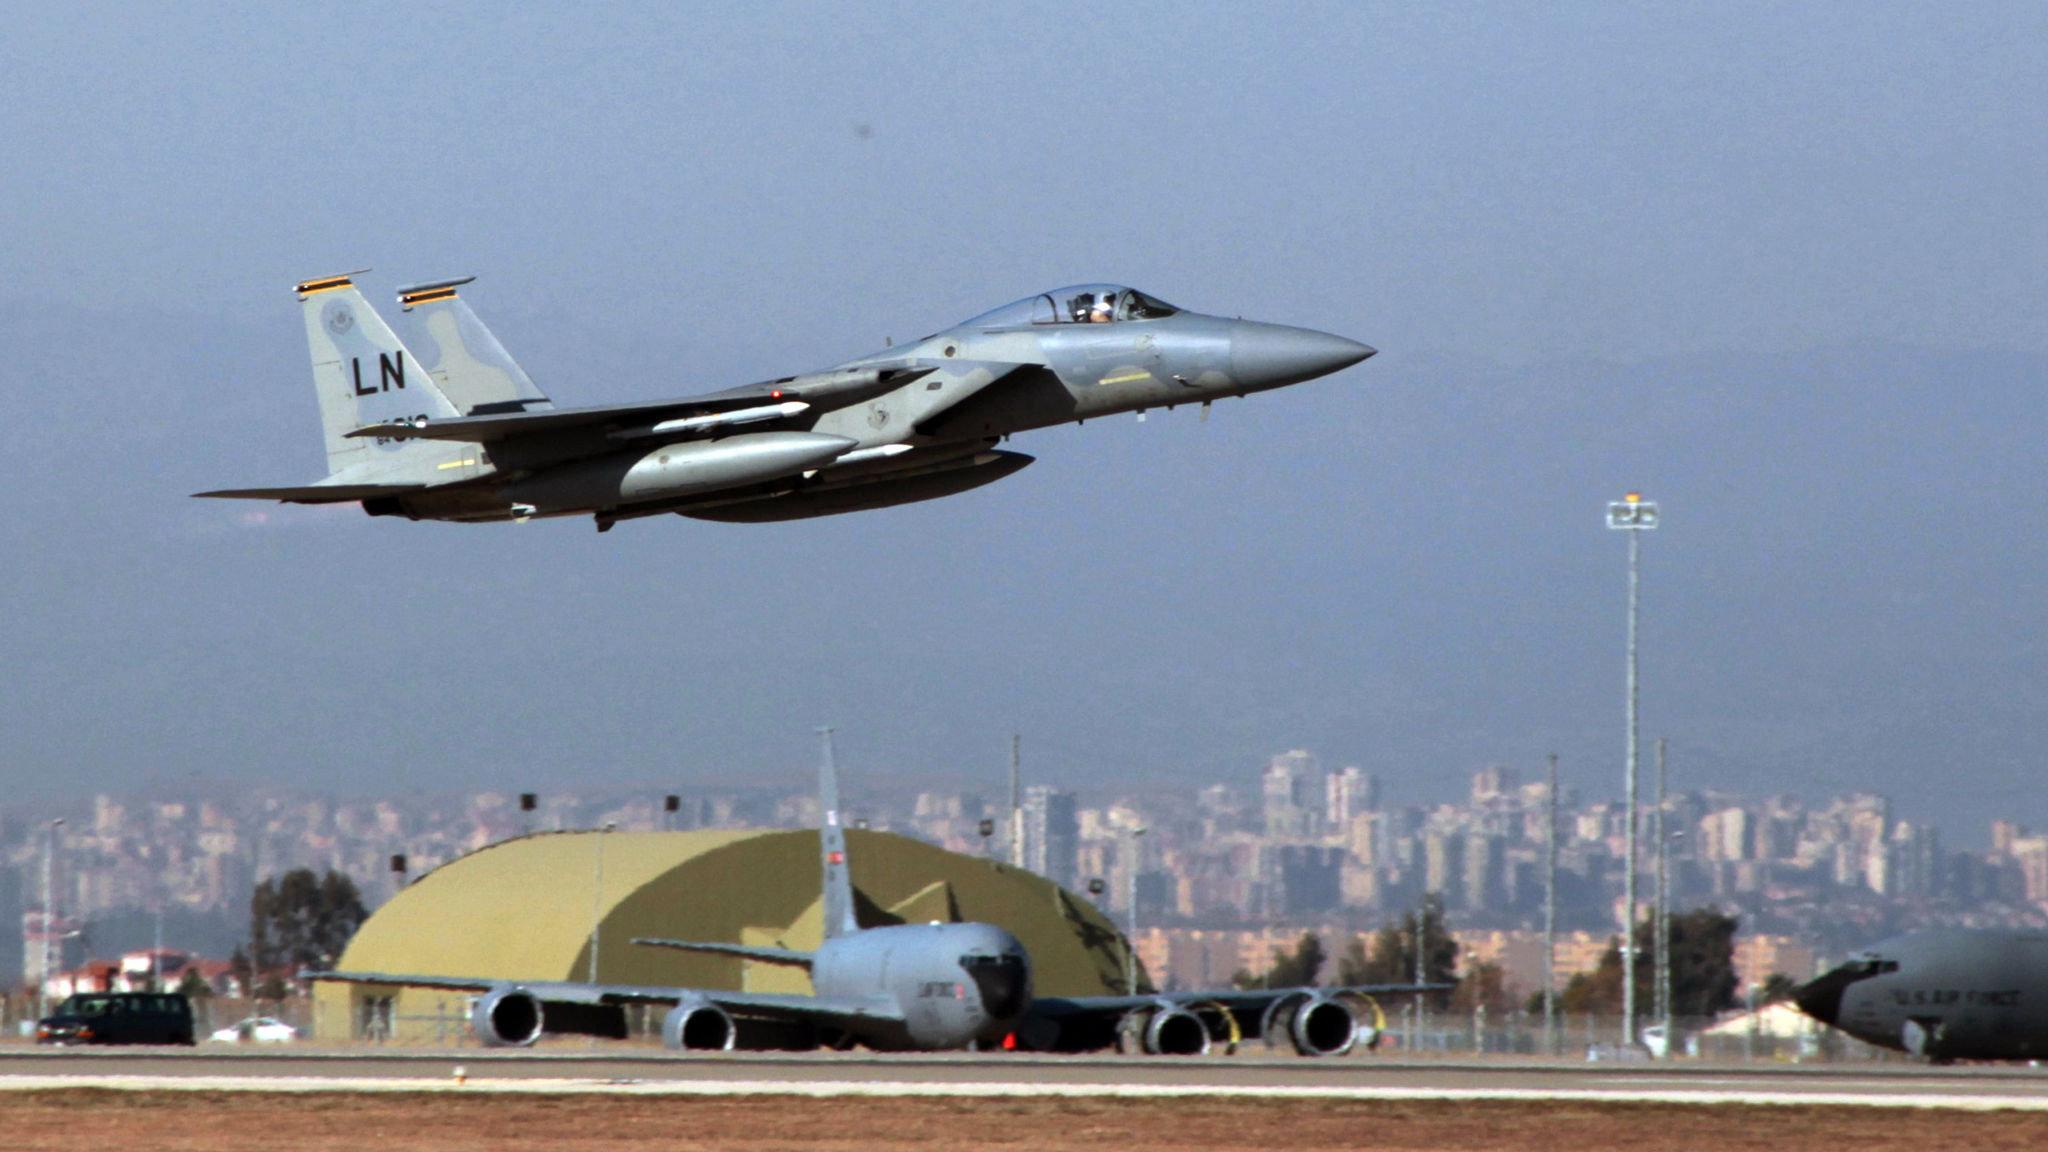 How the Syria-Turkey crisis has caused turmoil in Nato